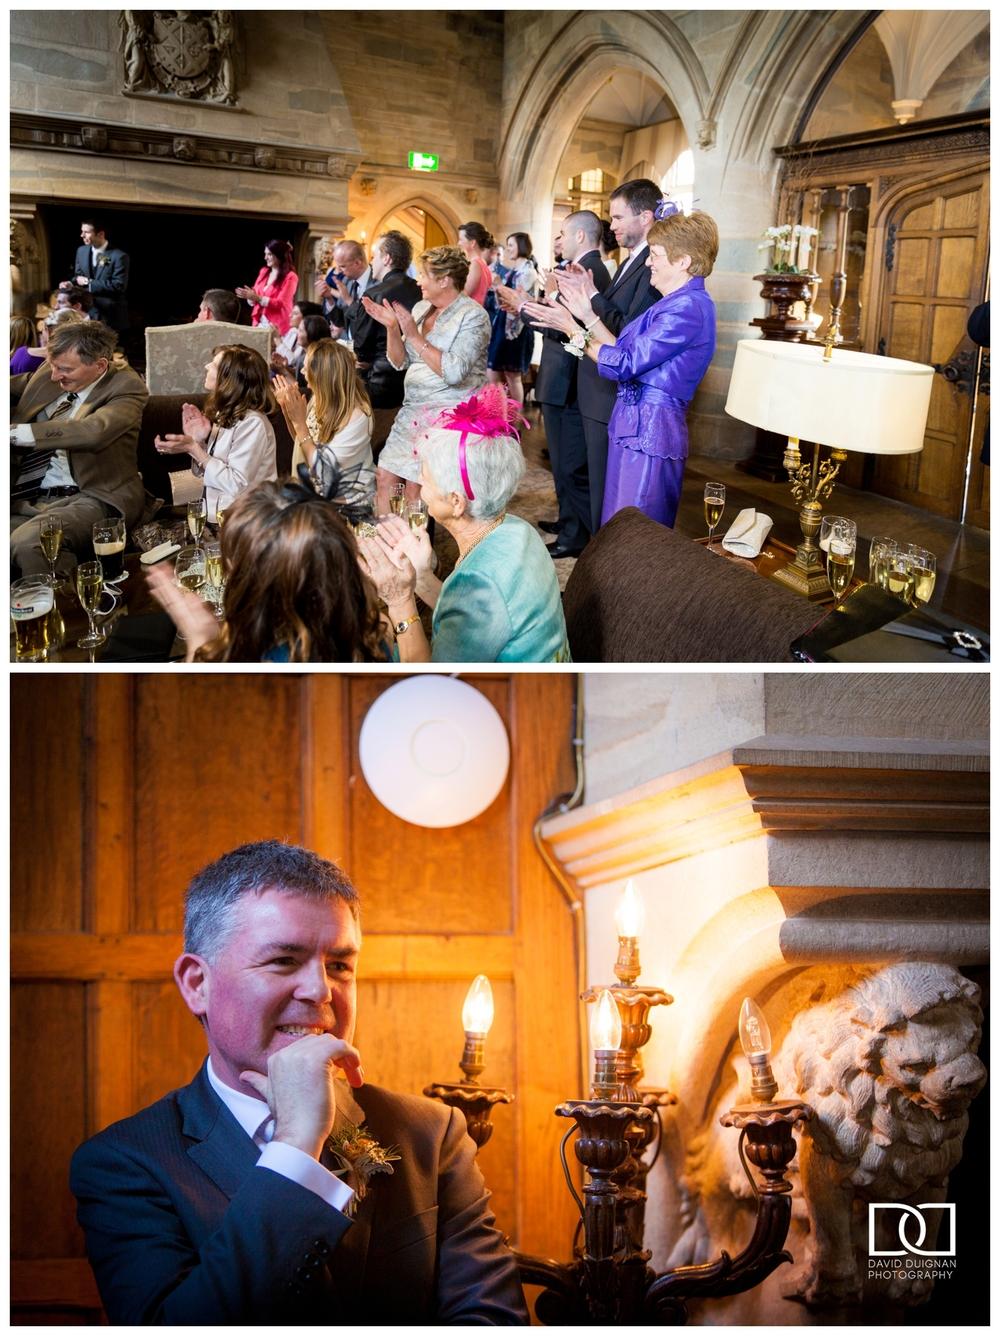 Dublin wedding photographer - Waterford Castle Wedding